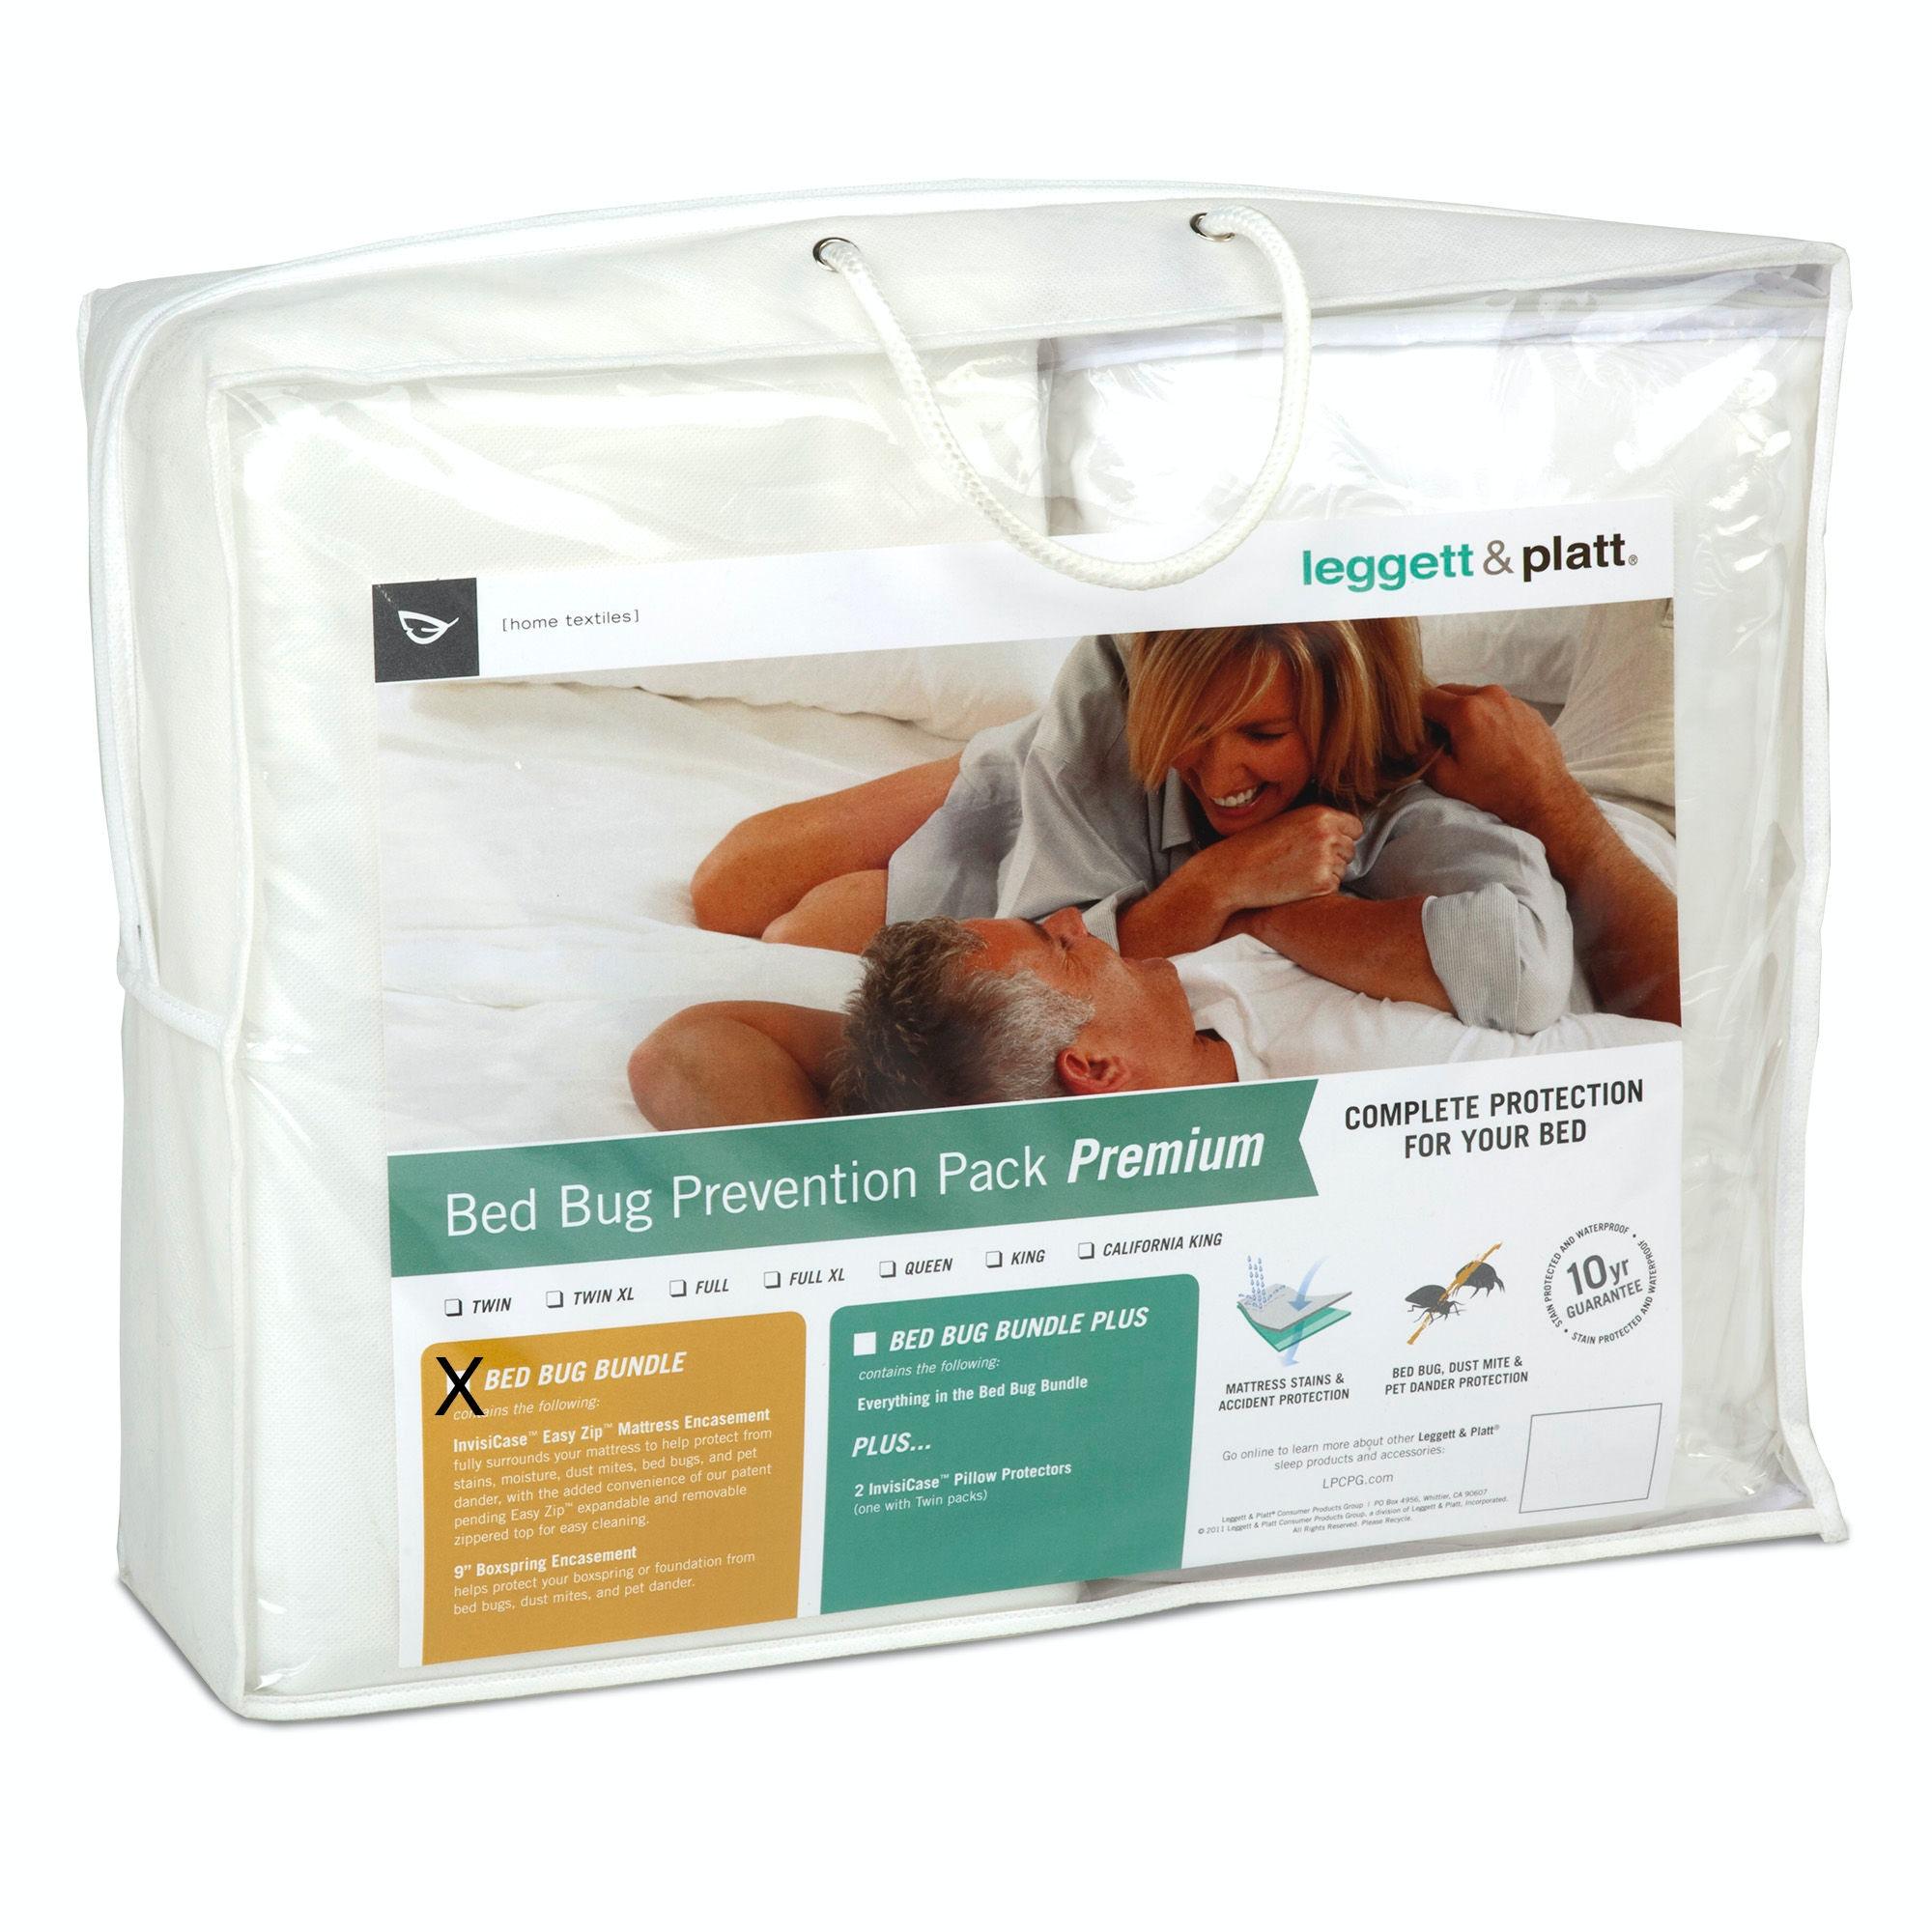 Leggett /& Platt Sleep Chill Mattress Protector with Soft and Moisture Resistant CoolMax Fabric Full XL